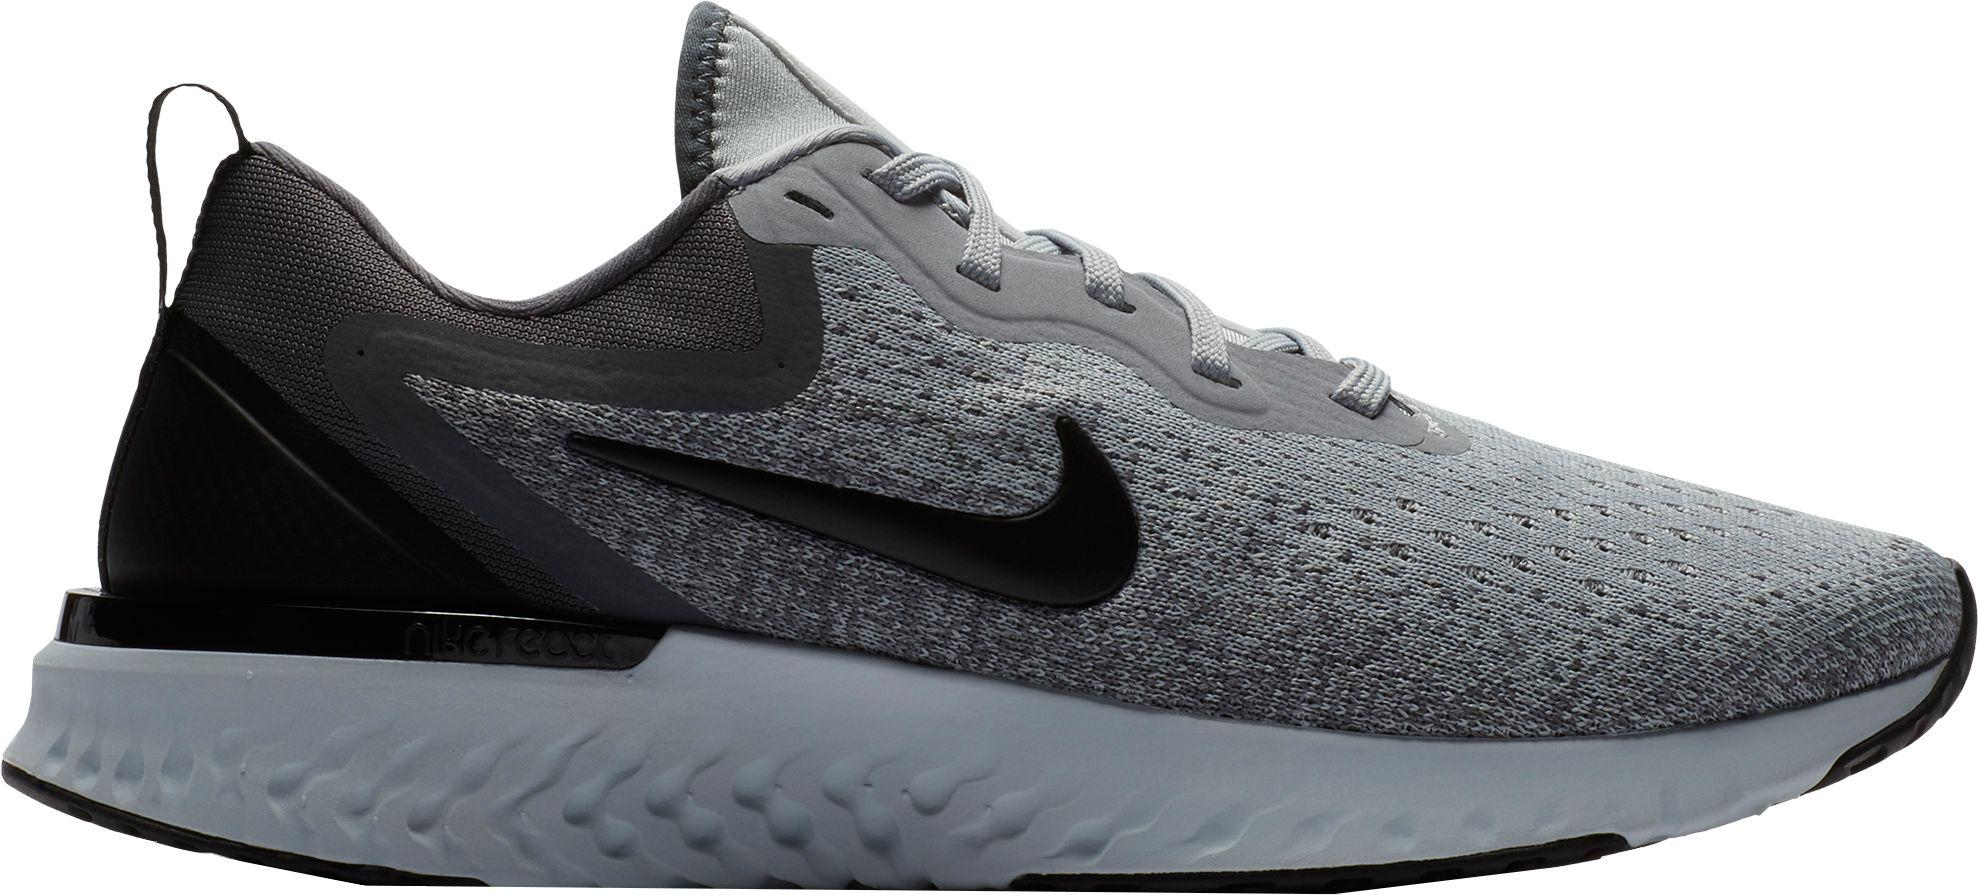 Nike. Women's Gray Odyssey React Running Sneakers